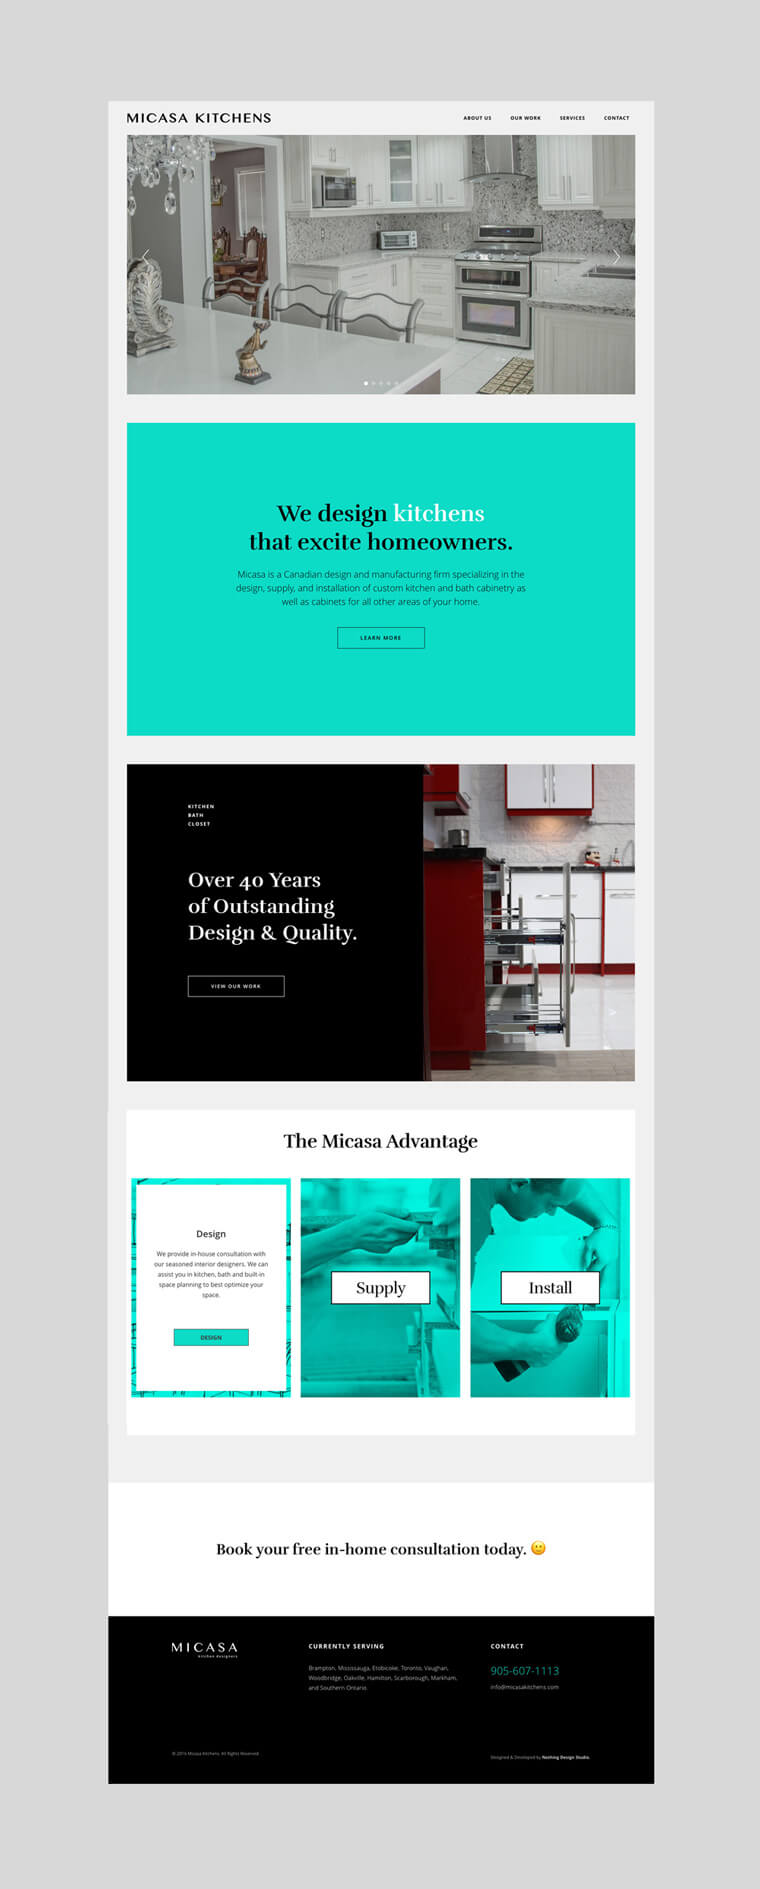 Micasa-website-1